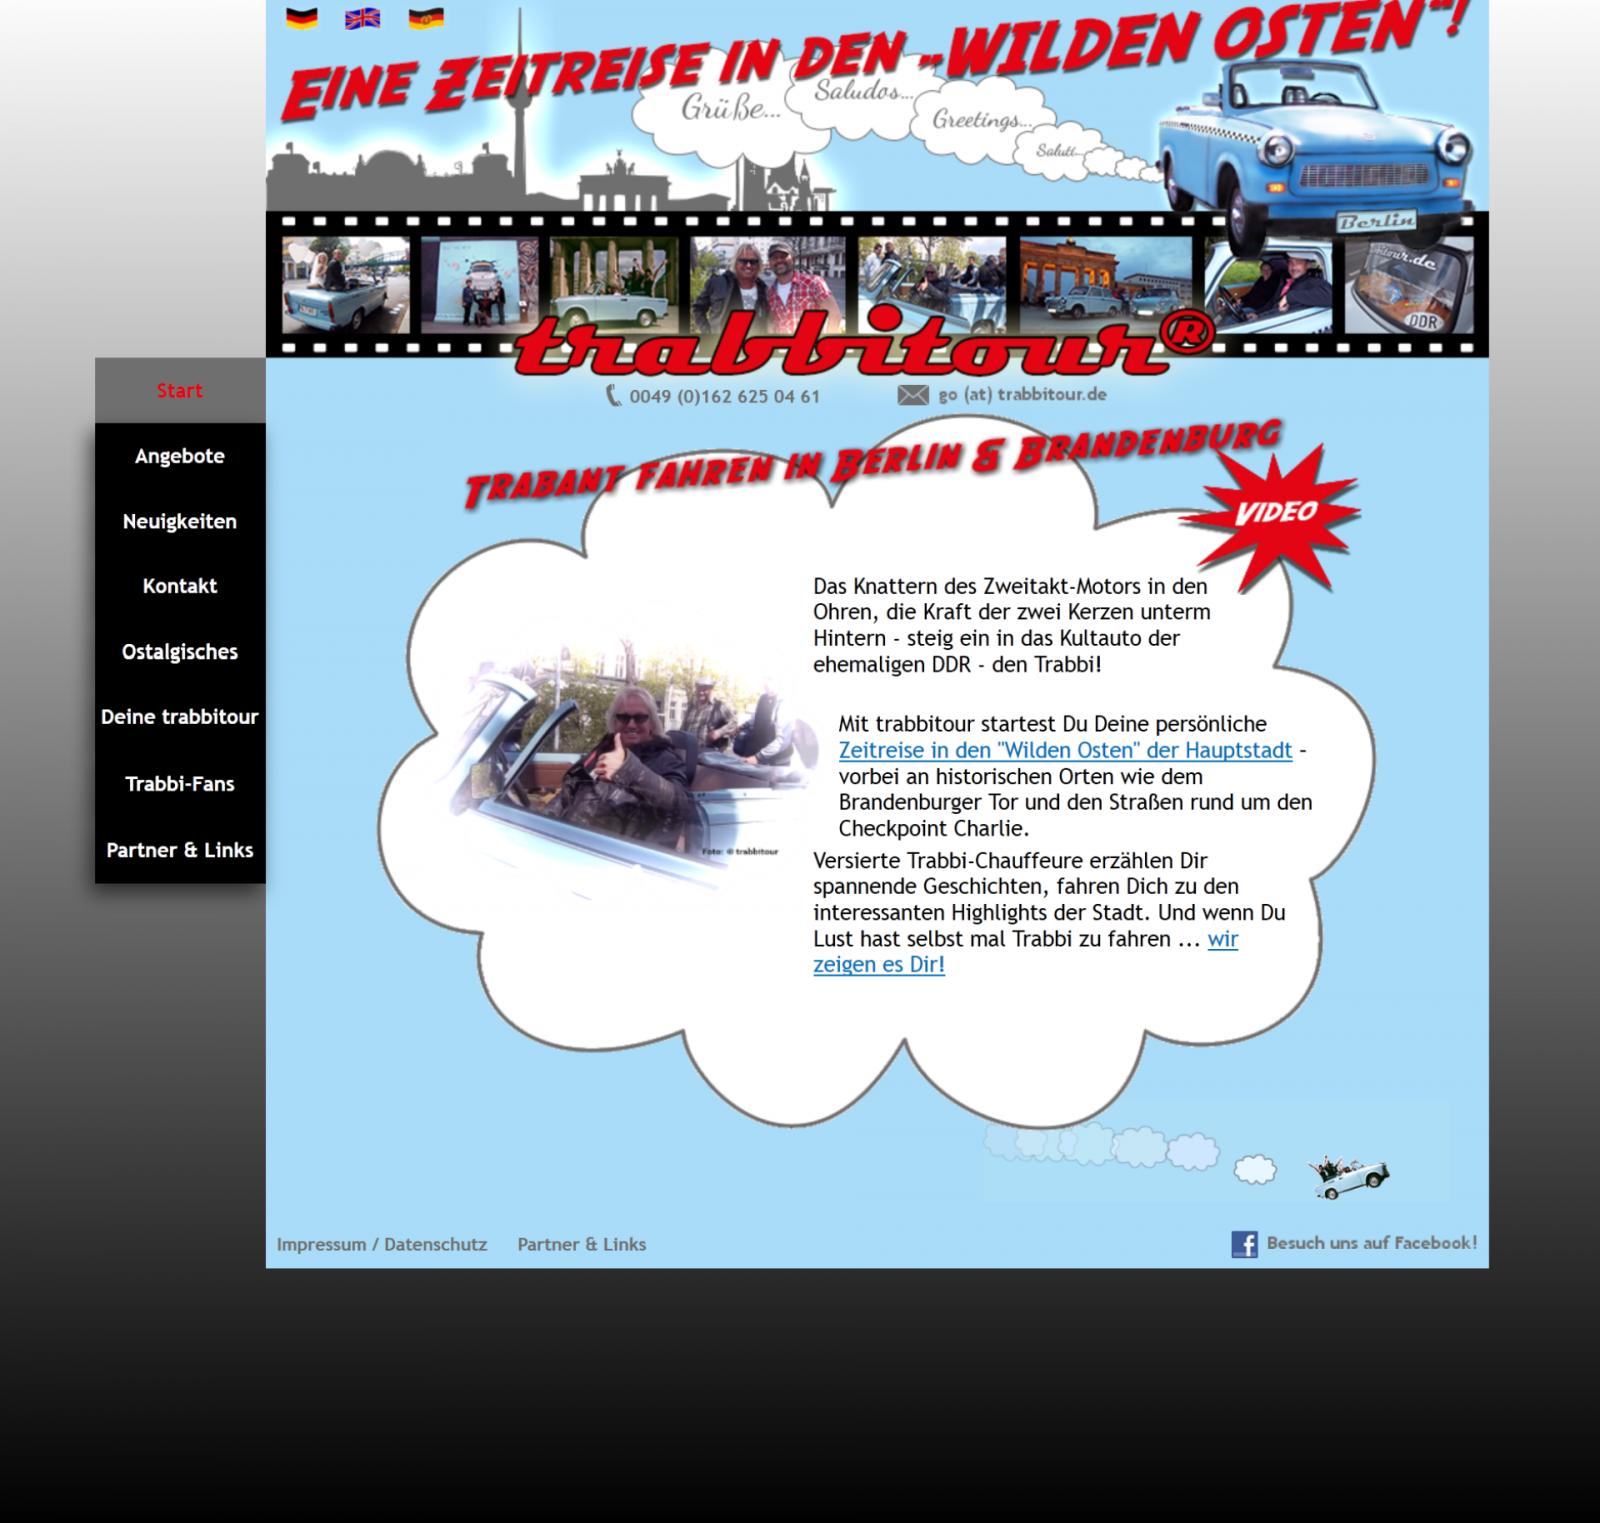 webdesign events berlin, webdesign touritinformation, design webseite trabbi fahren